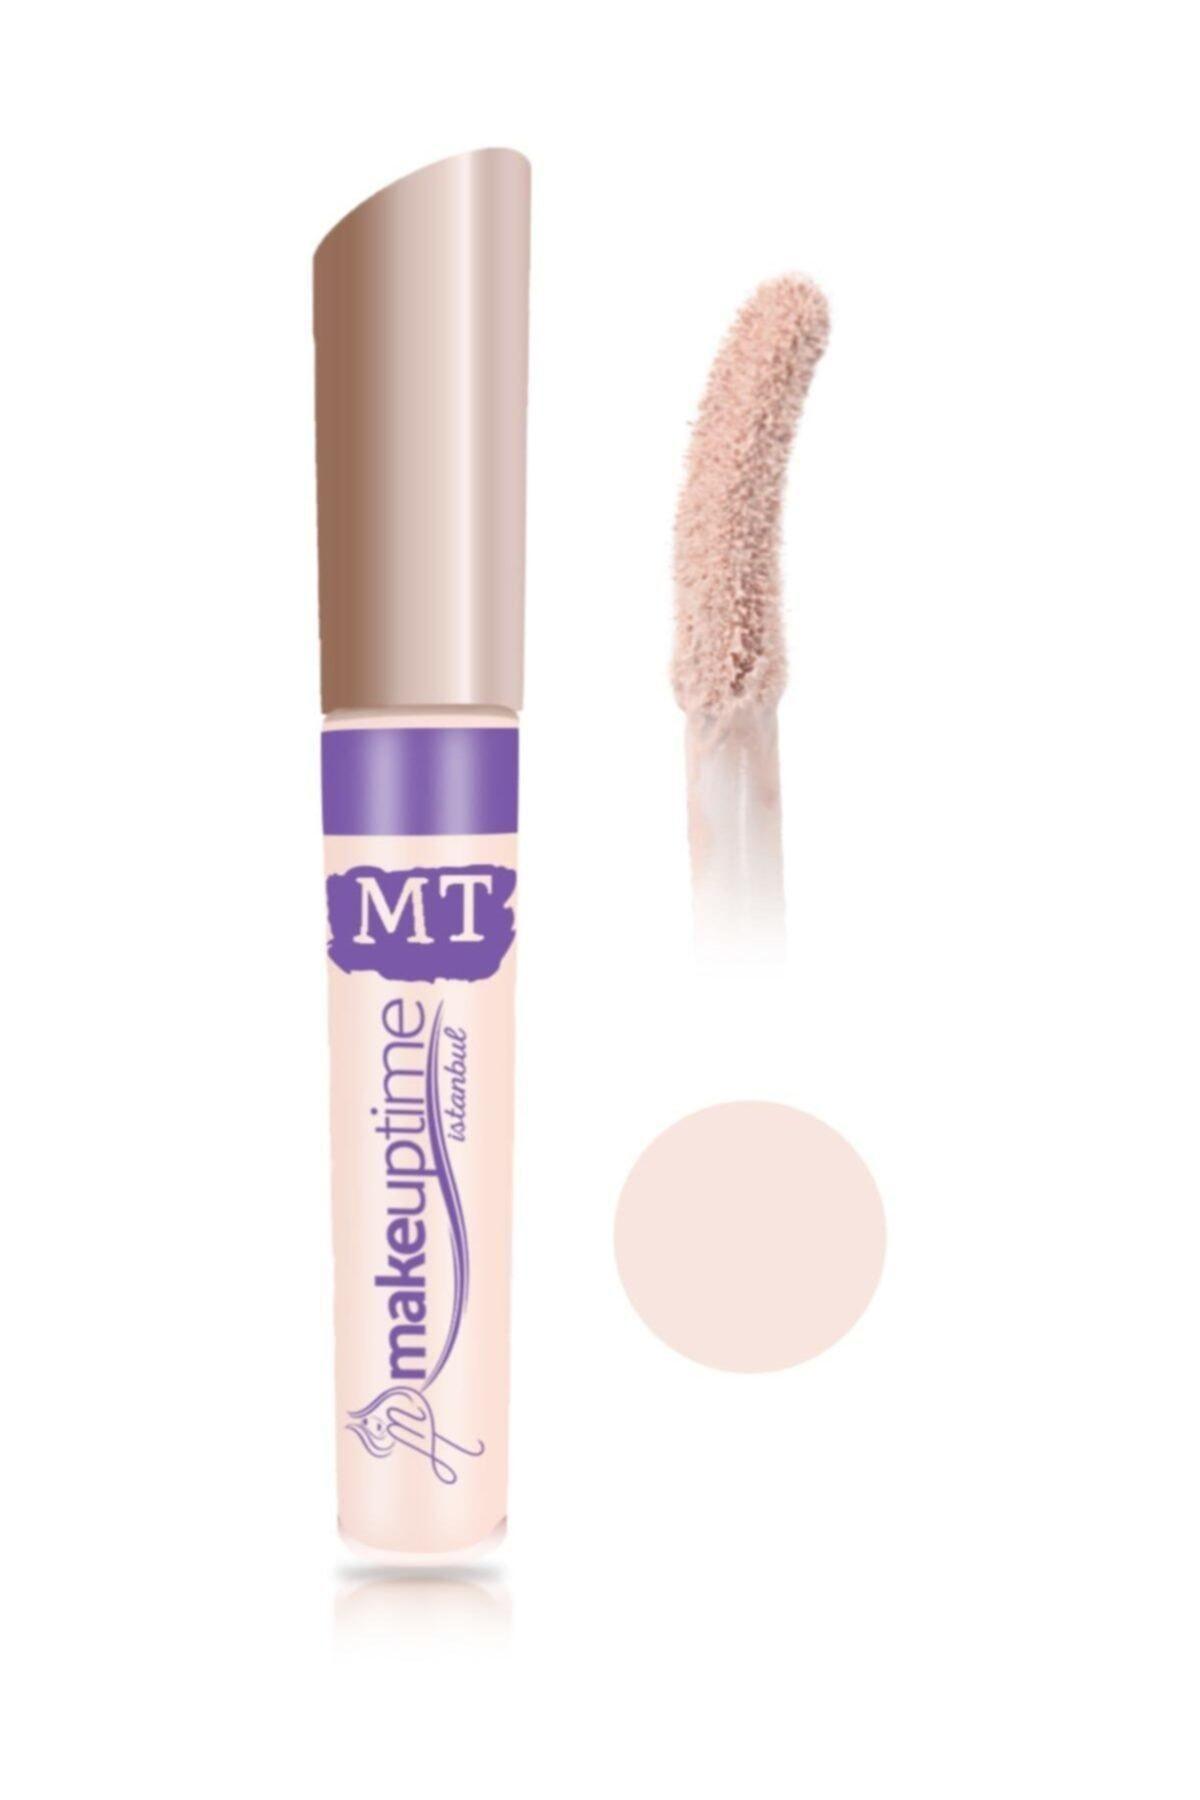 Makeuptime Mt Göz Altı Likit Kapatıcı Açık Ton 10 ml 1